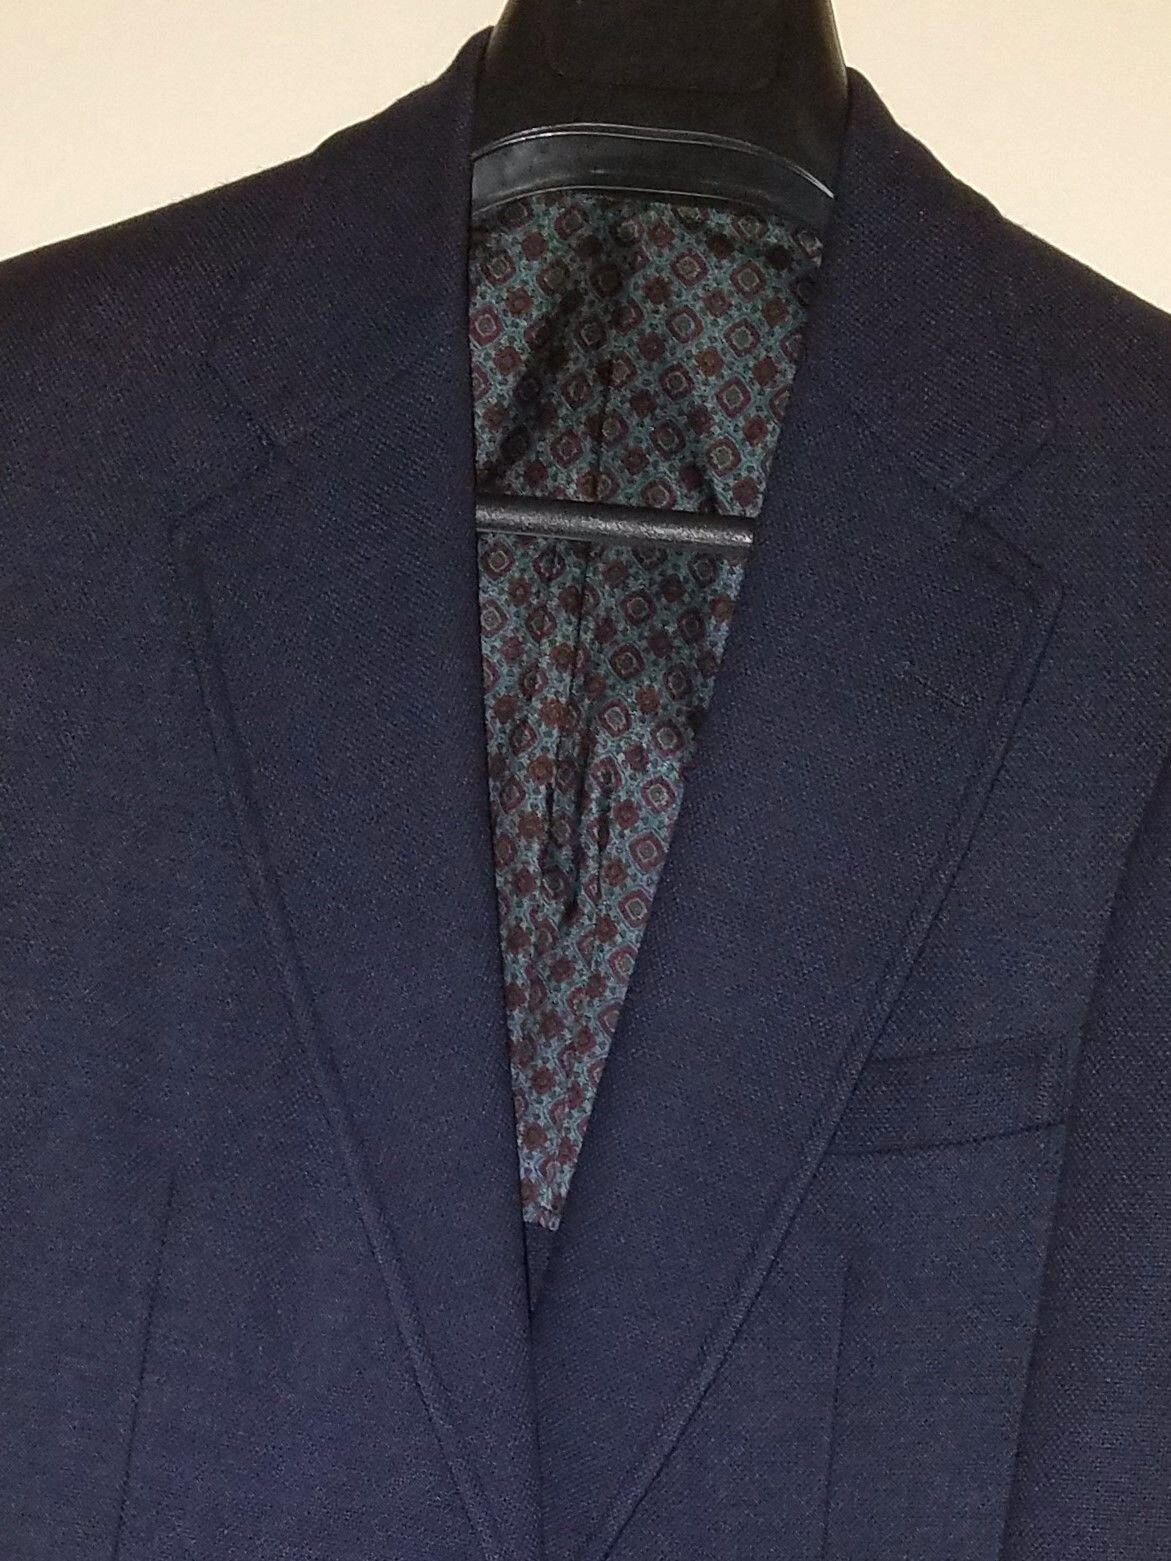 Vtg B Altman Murray Hill Collection Navy Blau 2 Button Center Vent Blazer